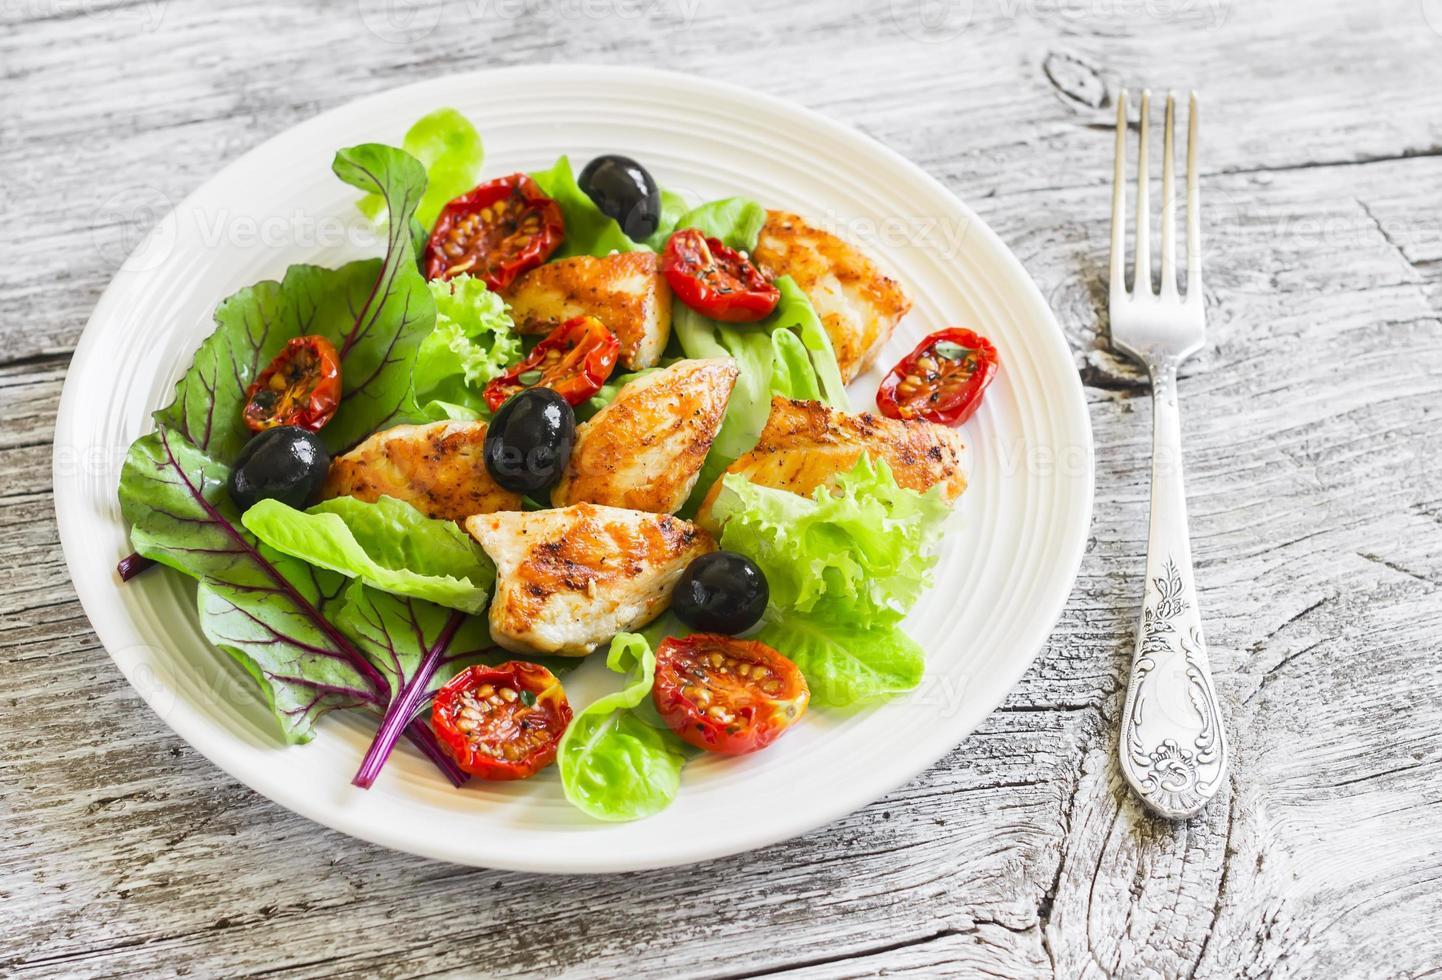 frisse salade met kipfilet, zongedroogde tomaten, groene salade foto